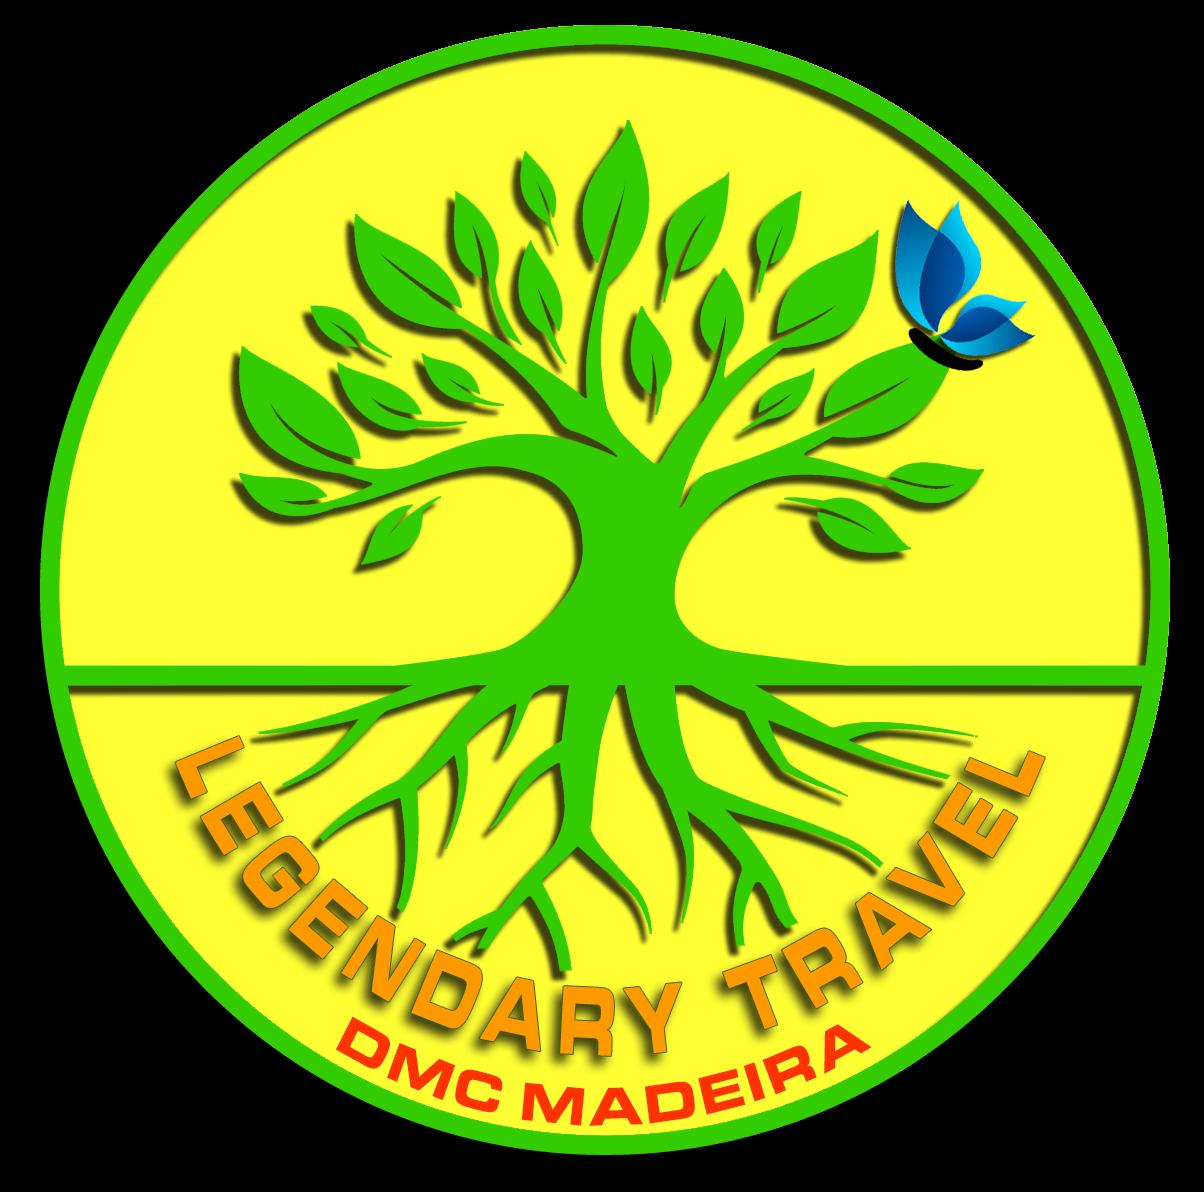 Avatar - Legendary Travel Madeira